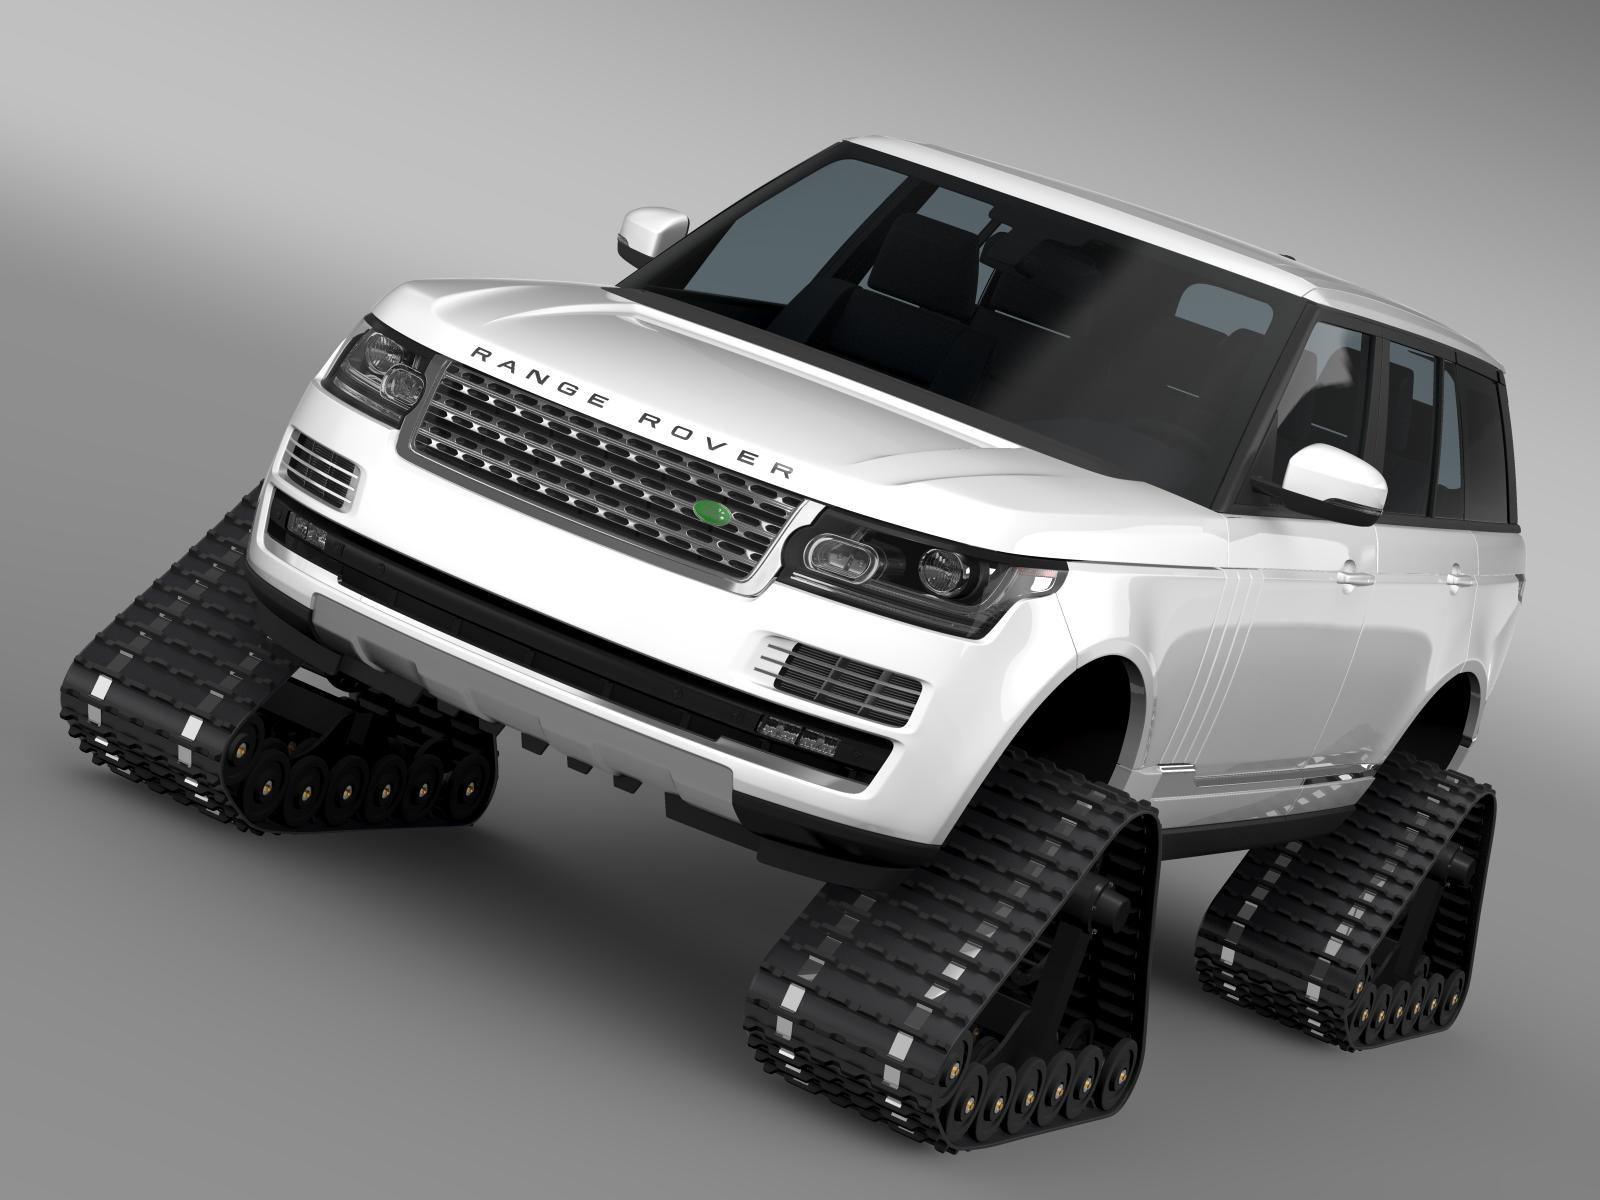 range rover supercharged l405 crawler 2016 3d model 3ds max fbx c4d lwo ma mb hrc xsi obj 218004